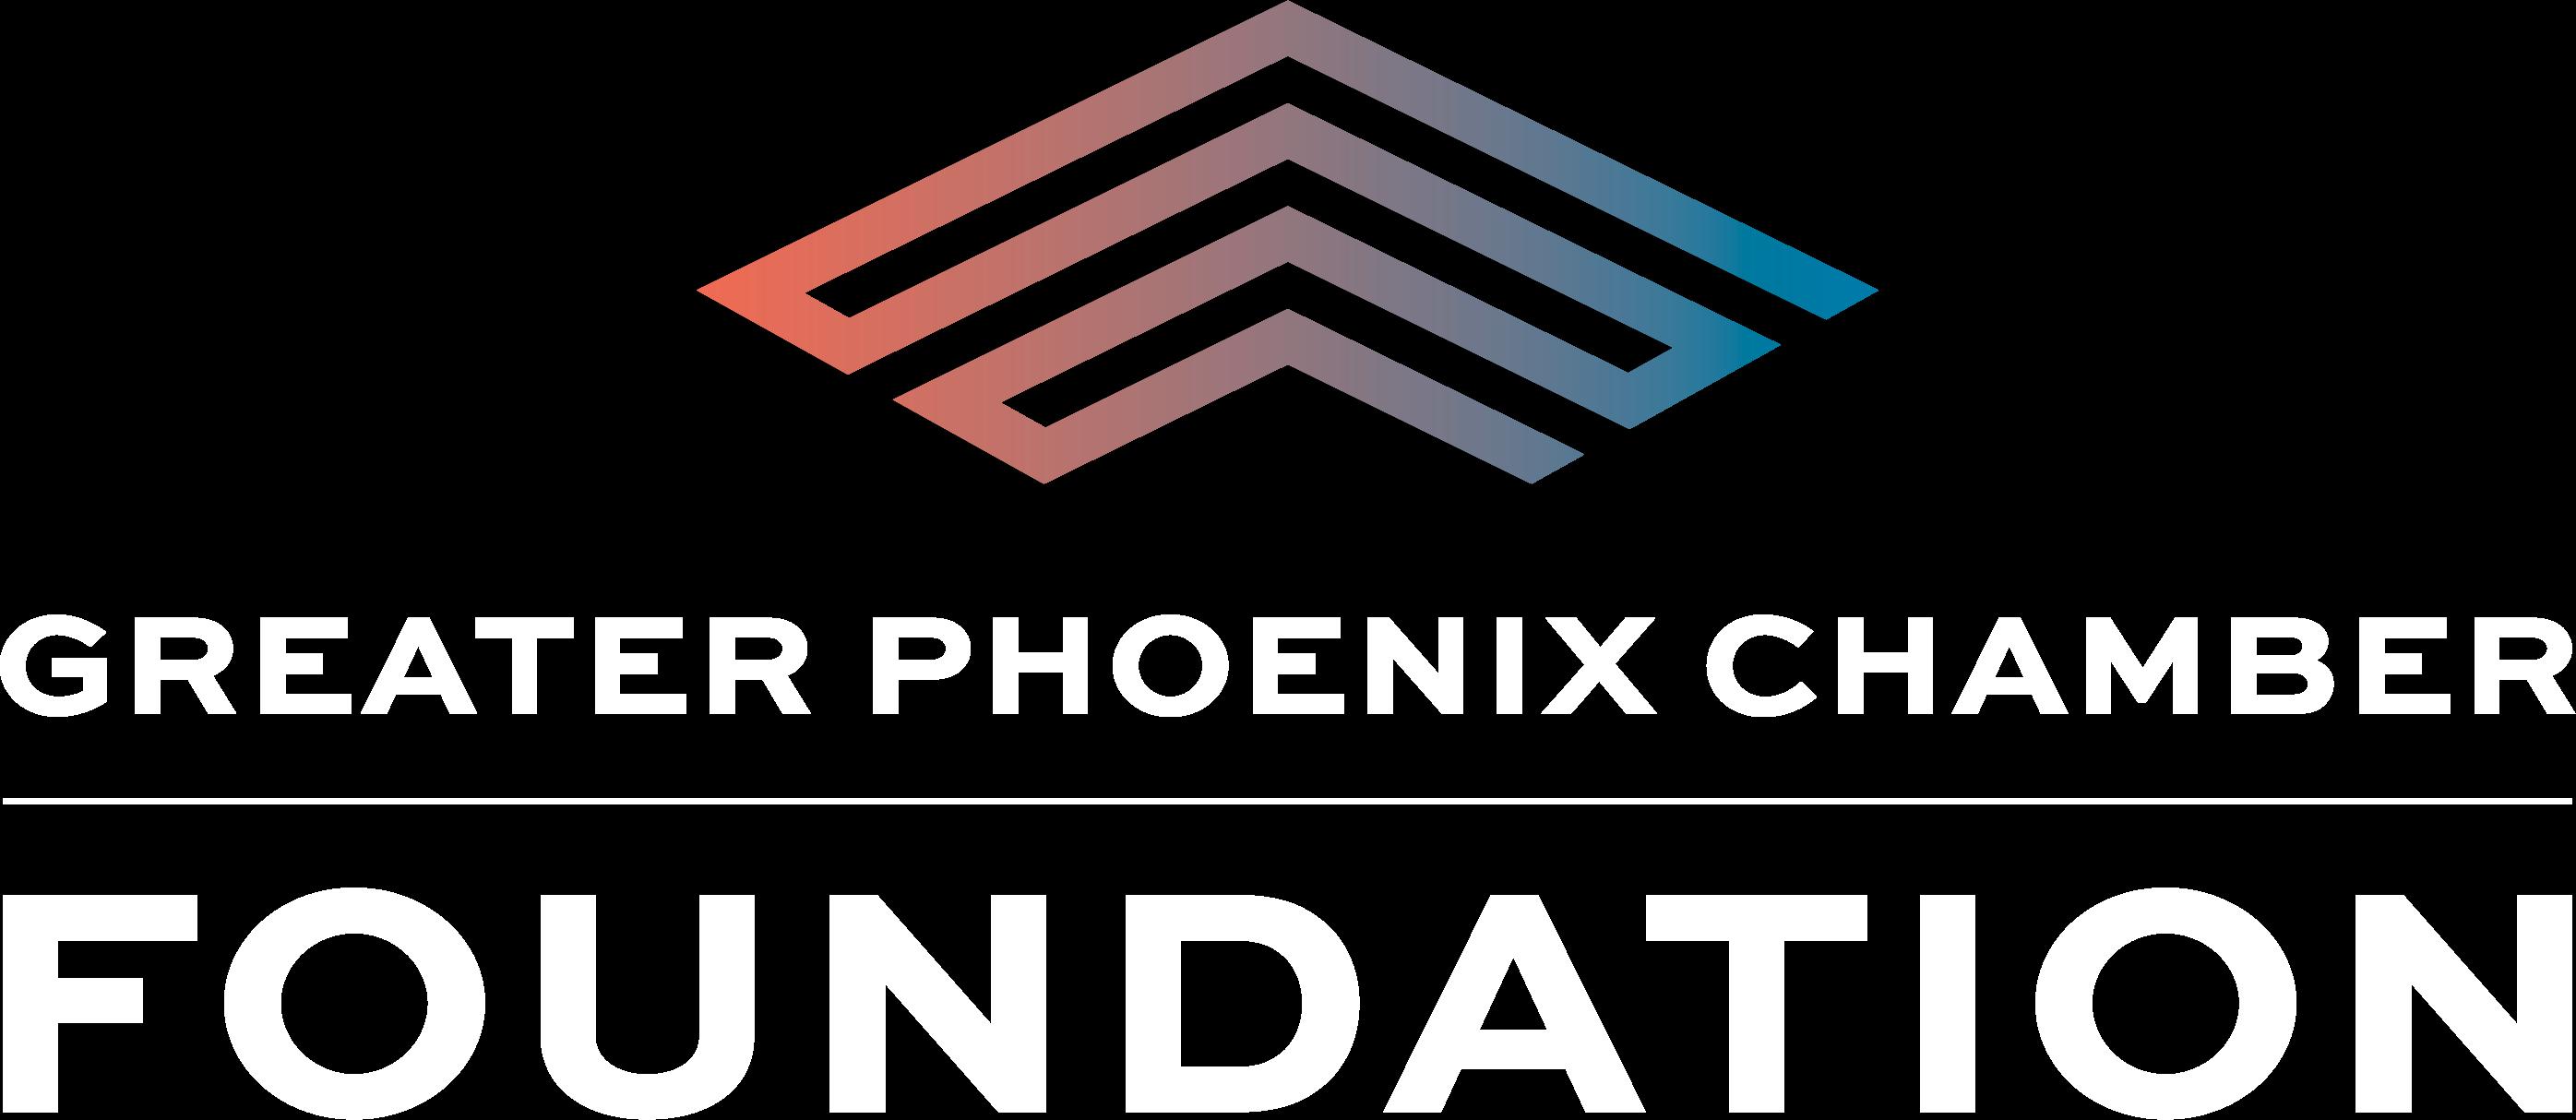 Greater Phoenix Chamber Foundation